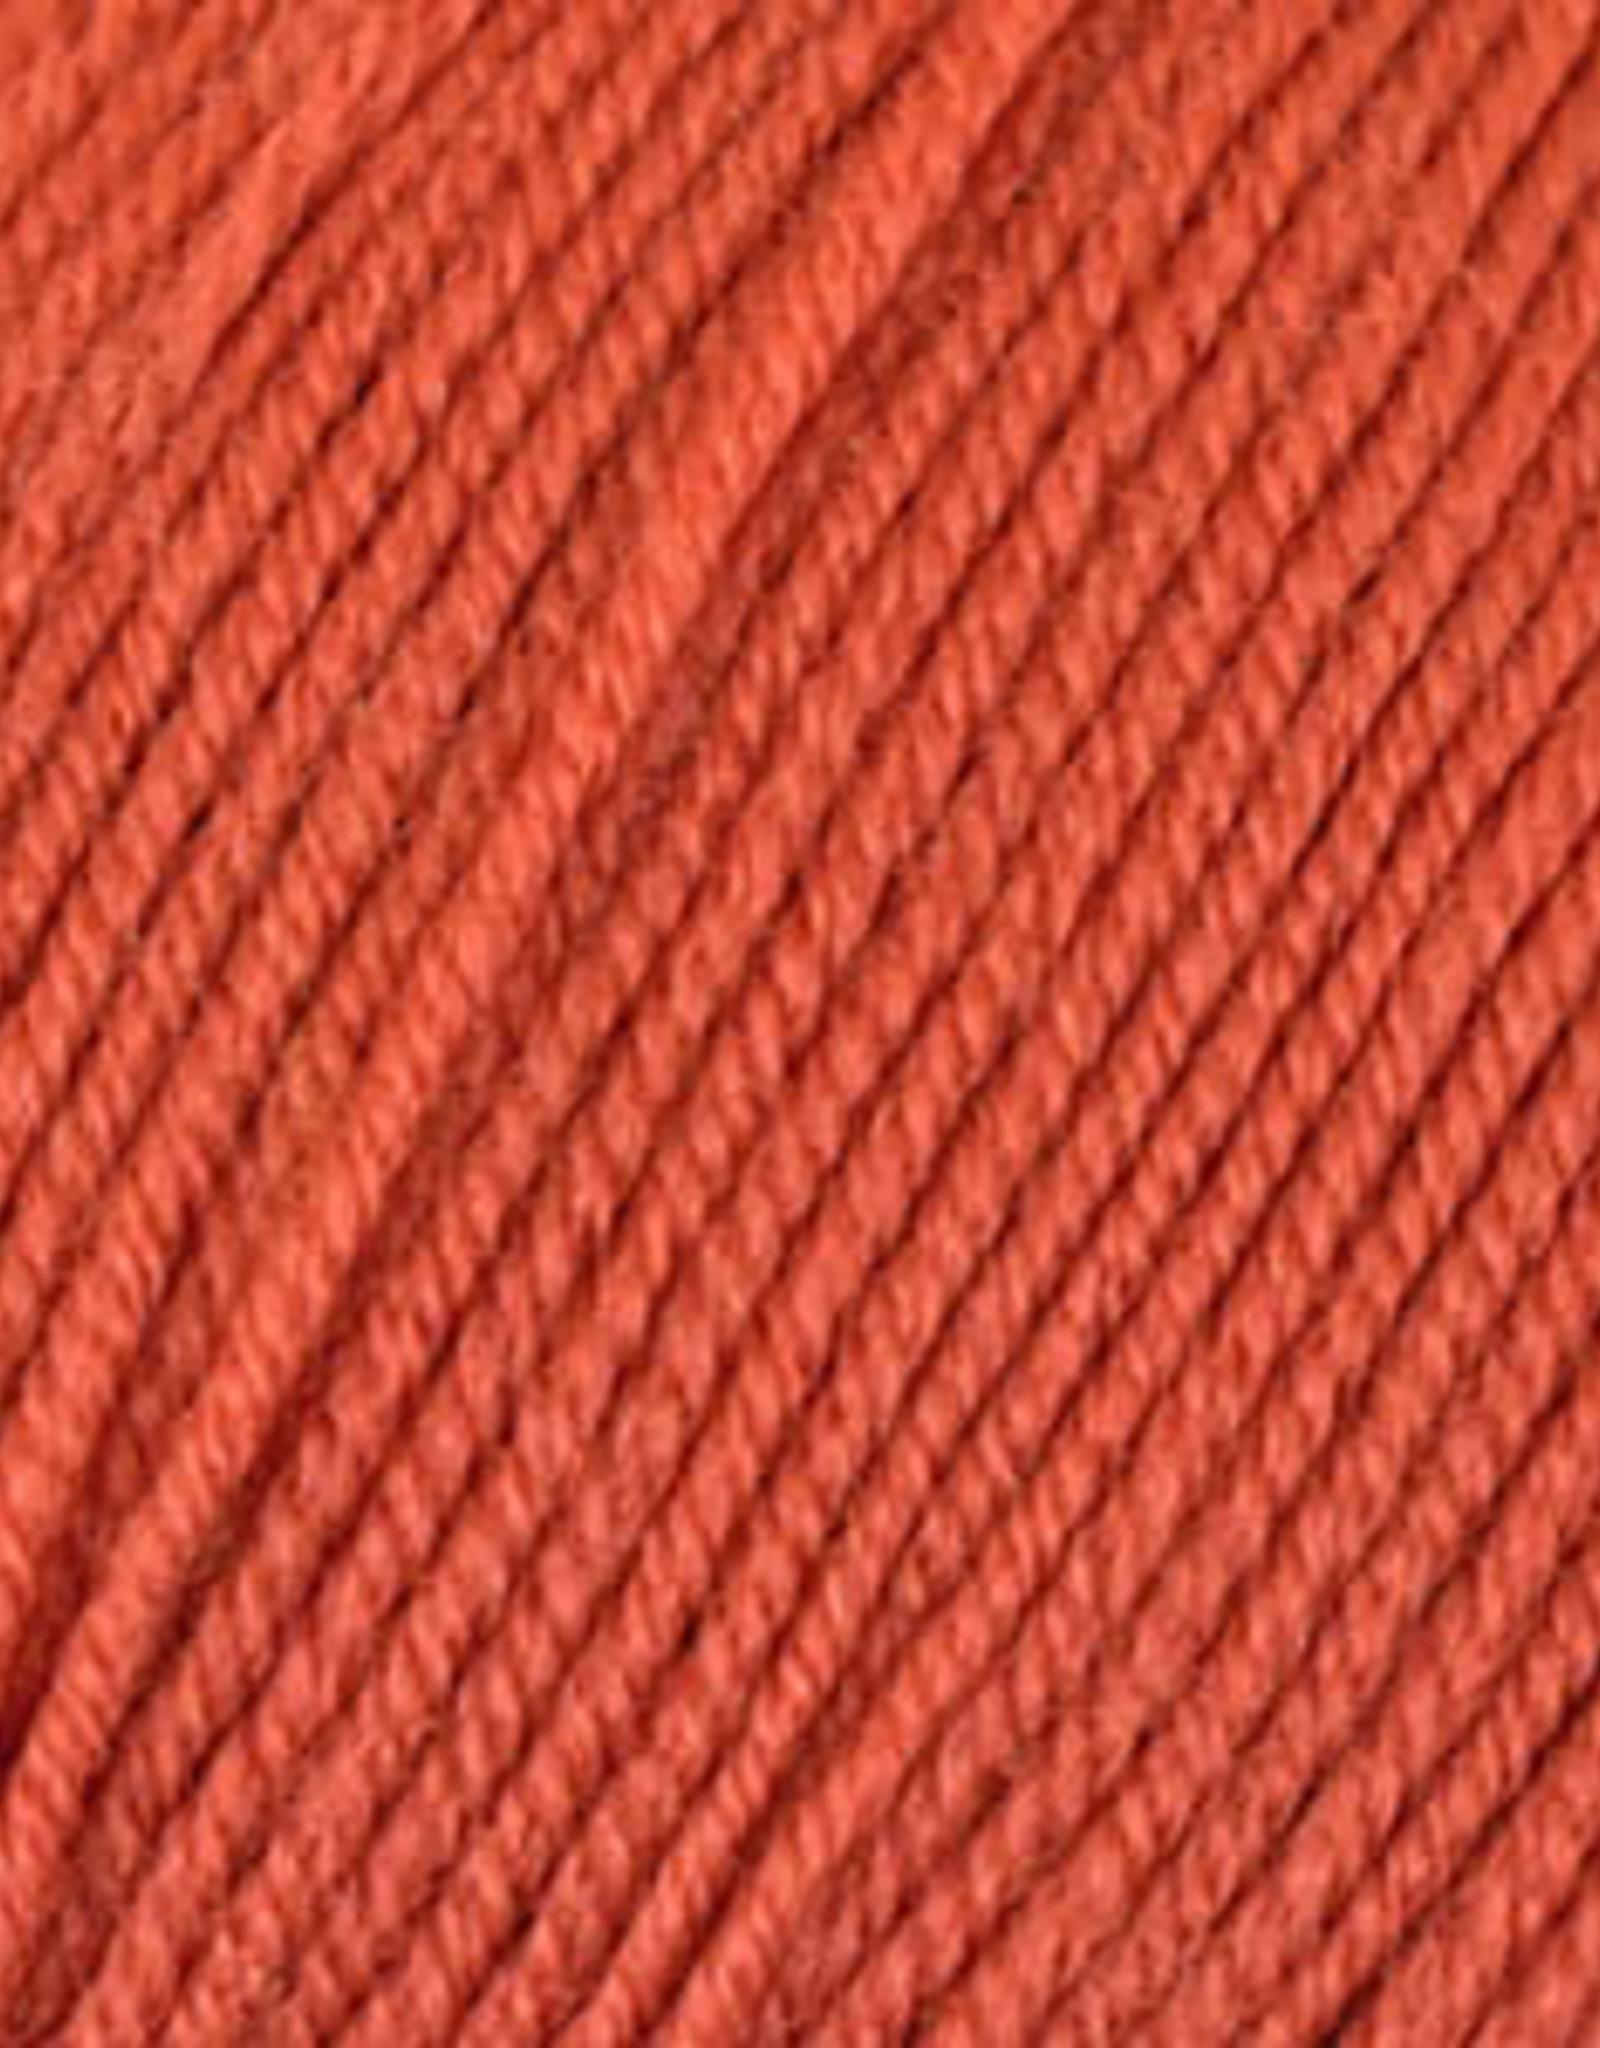 Universal Yarn Donnina 205 Coral Brandy